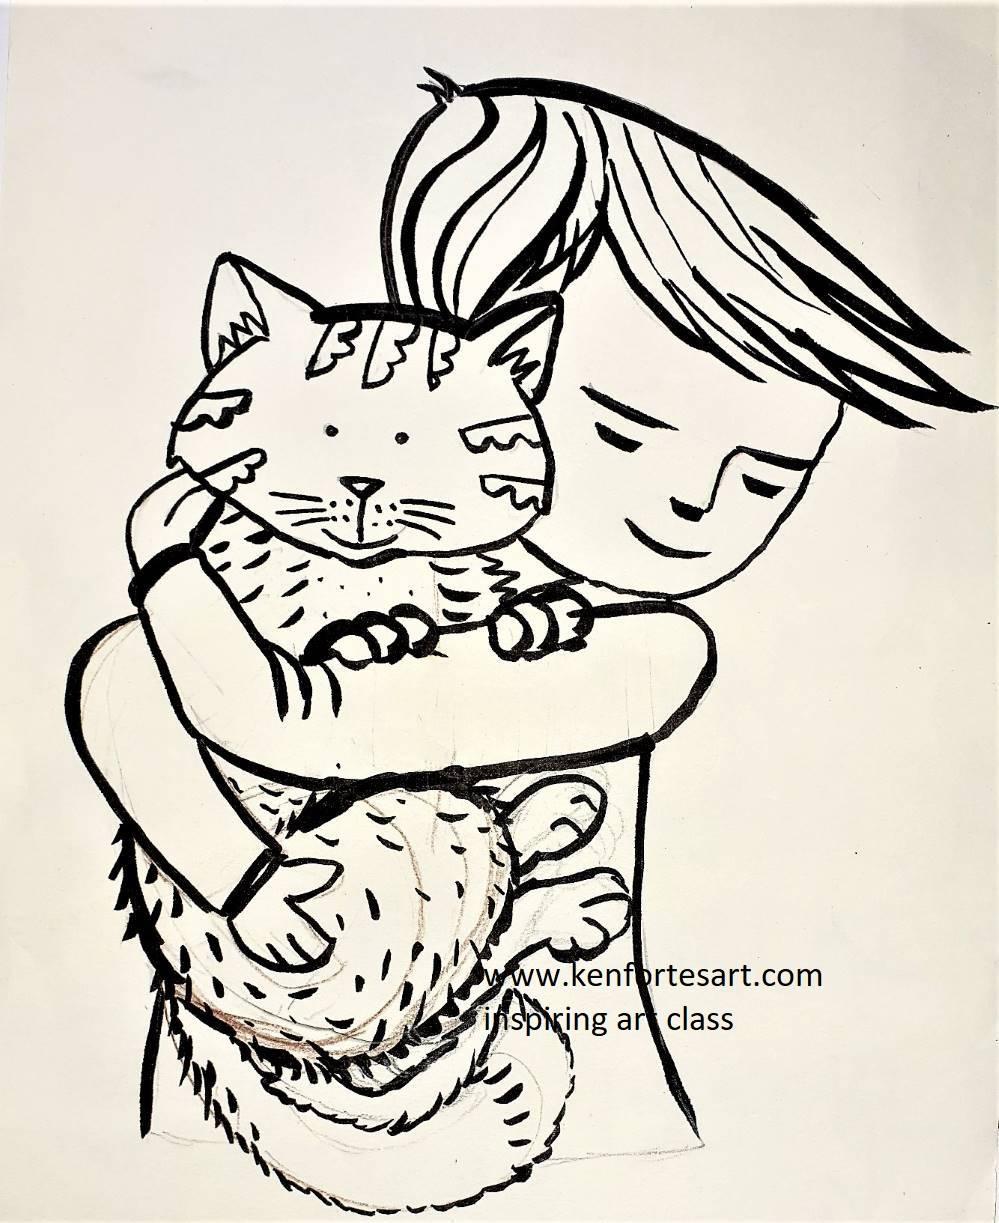 Boy cuddling his pet CAT - children art kenfortes online arts classes india - pencils and paints art works